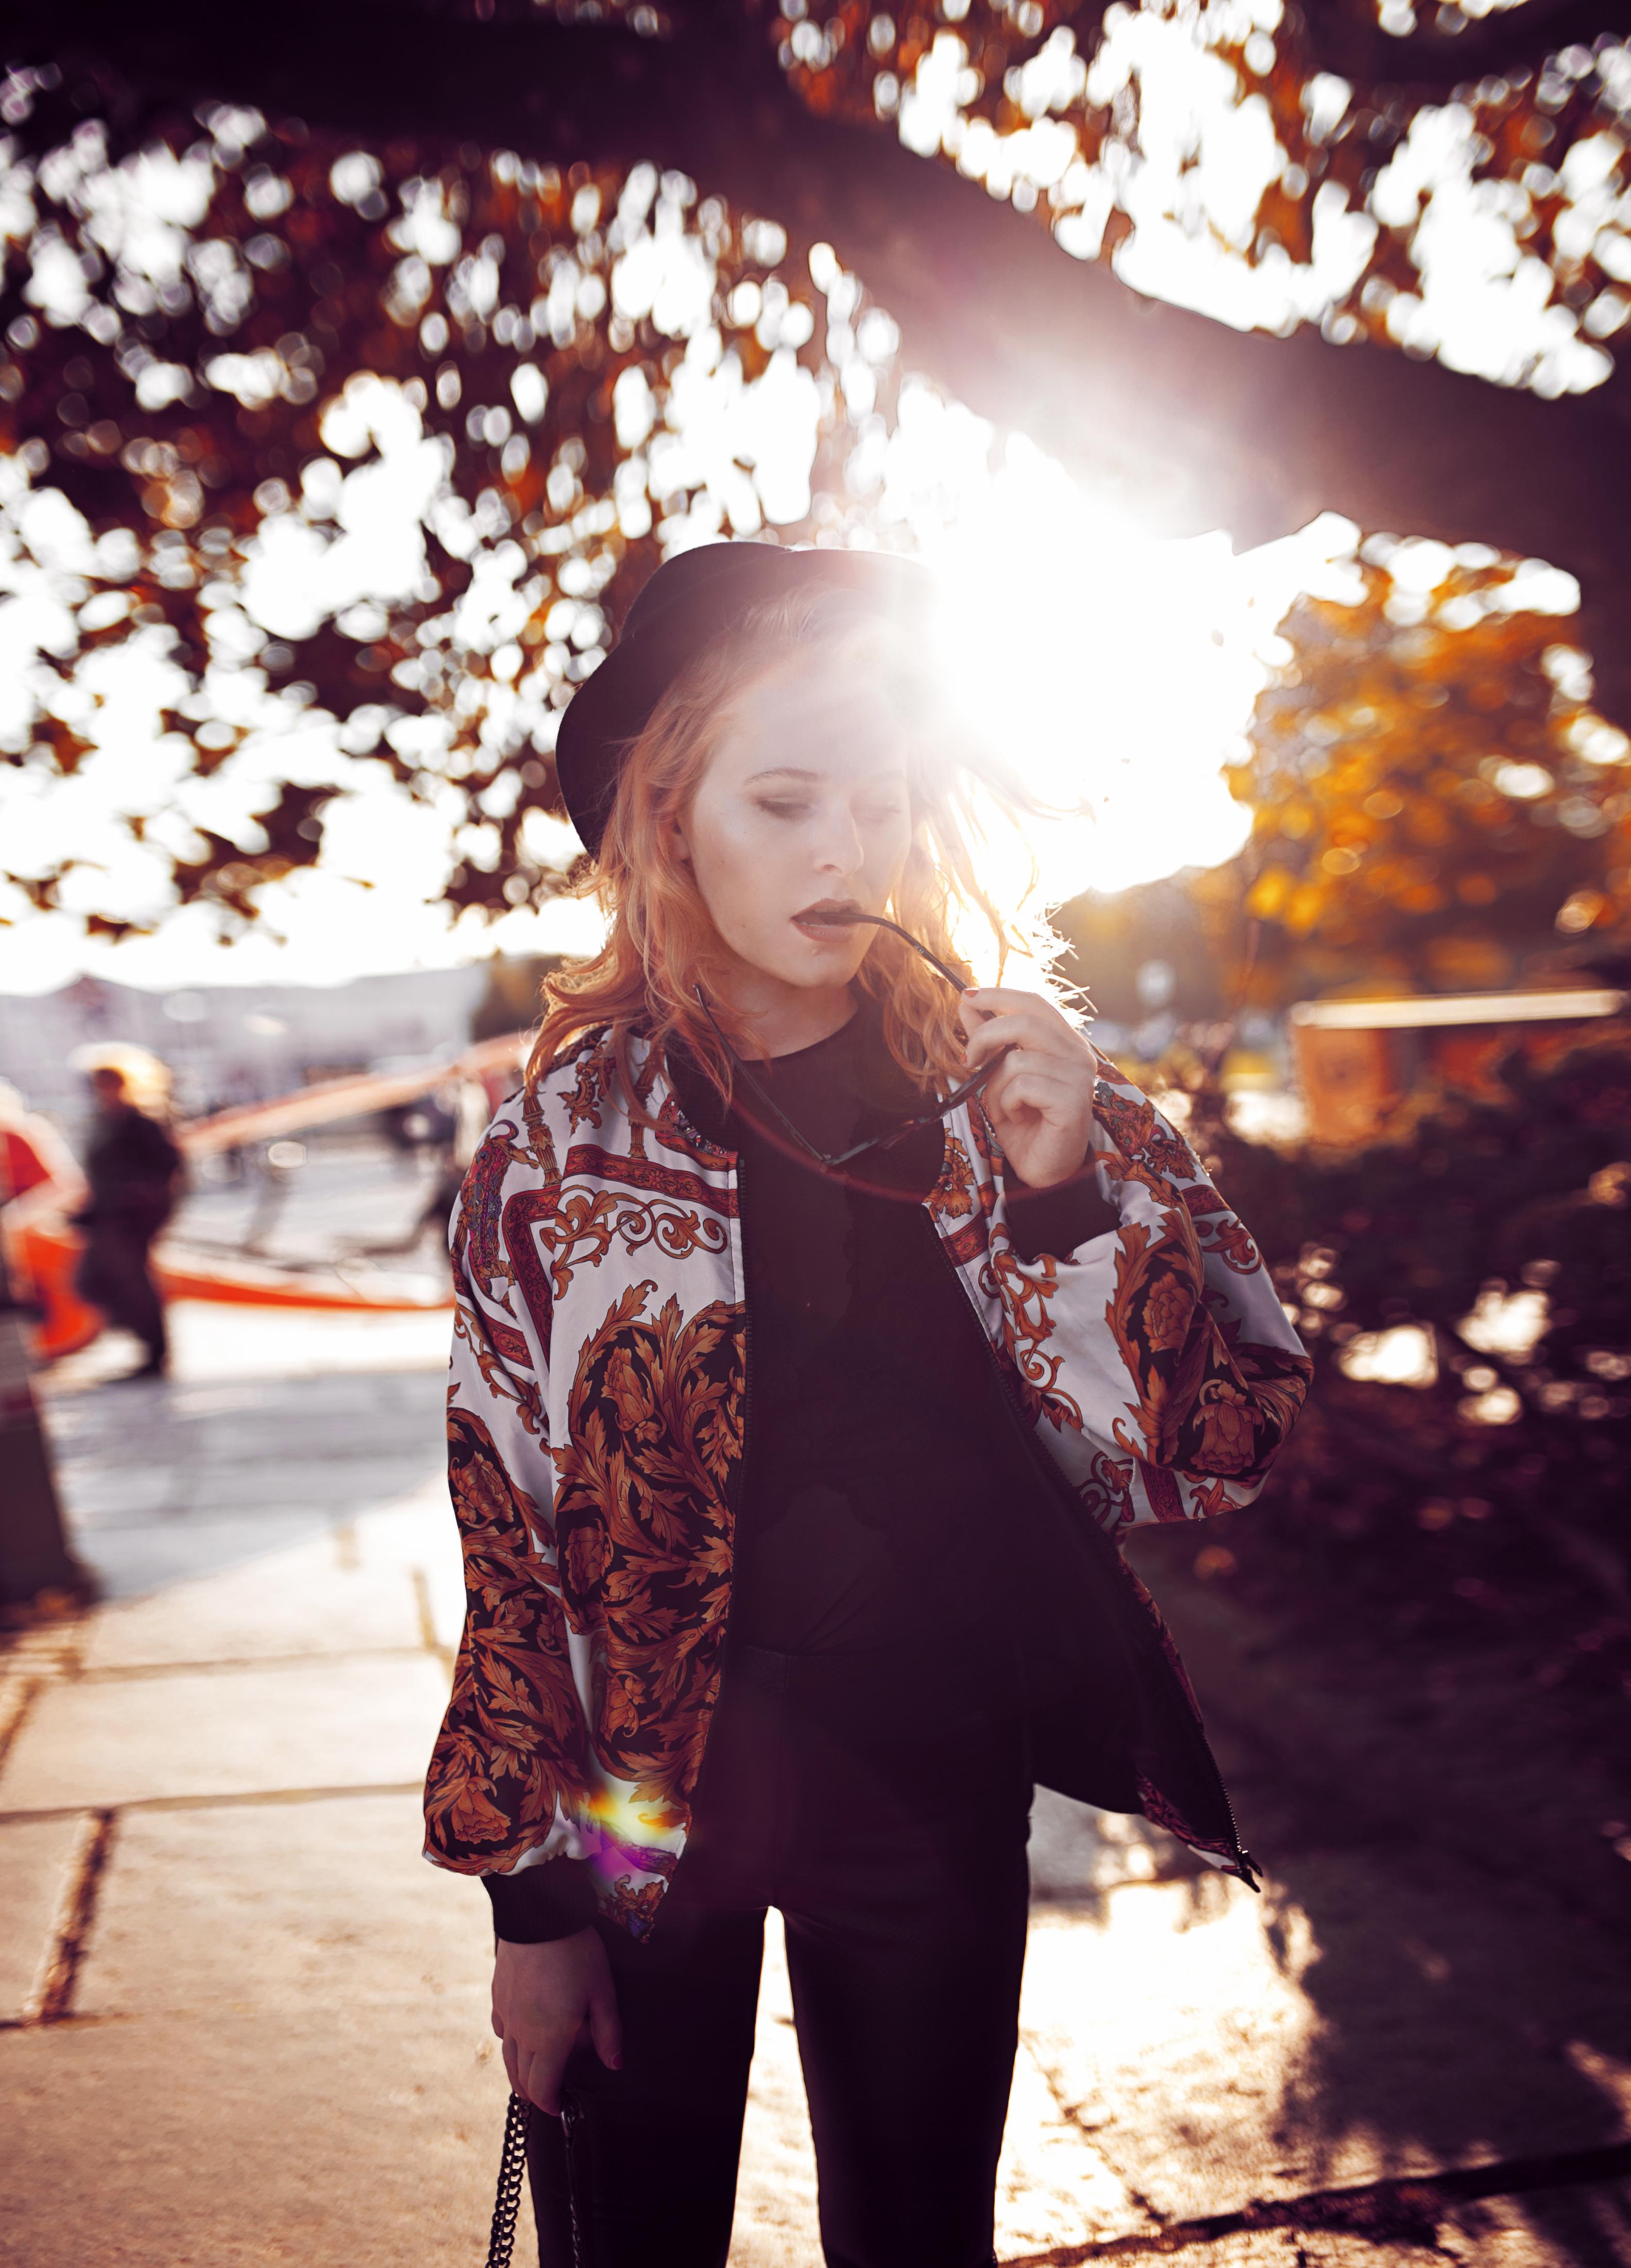 Herbst Outfit Vintage Bomberjacke Hut und Chucks Christina Key